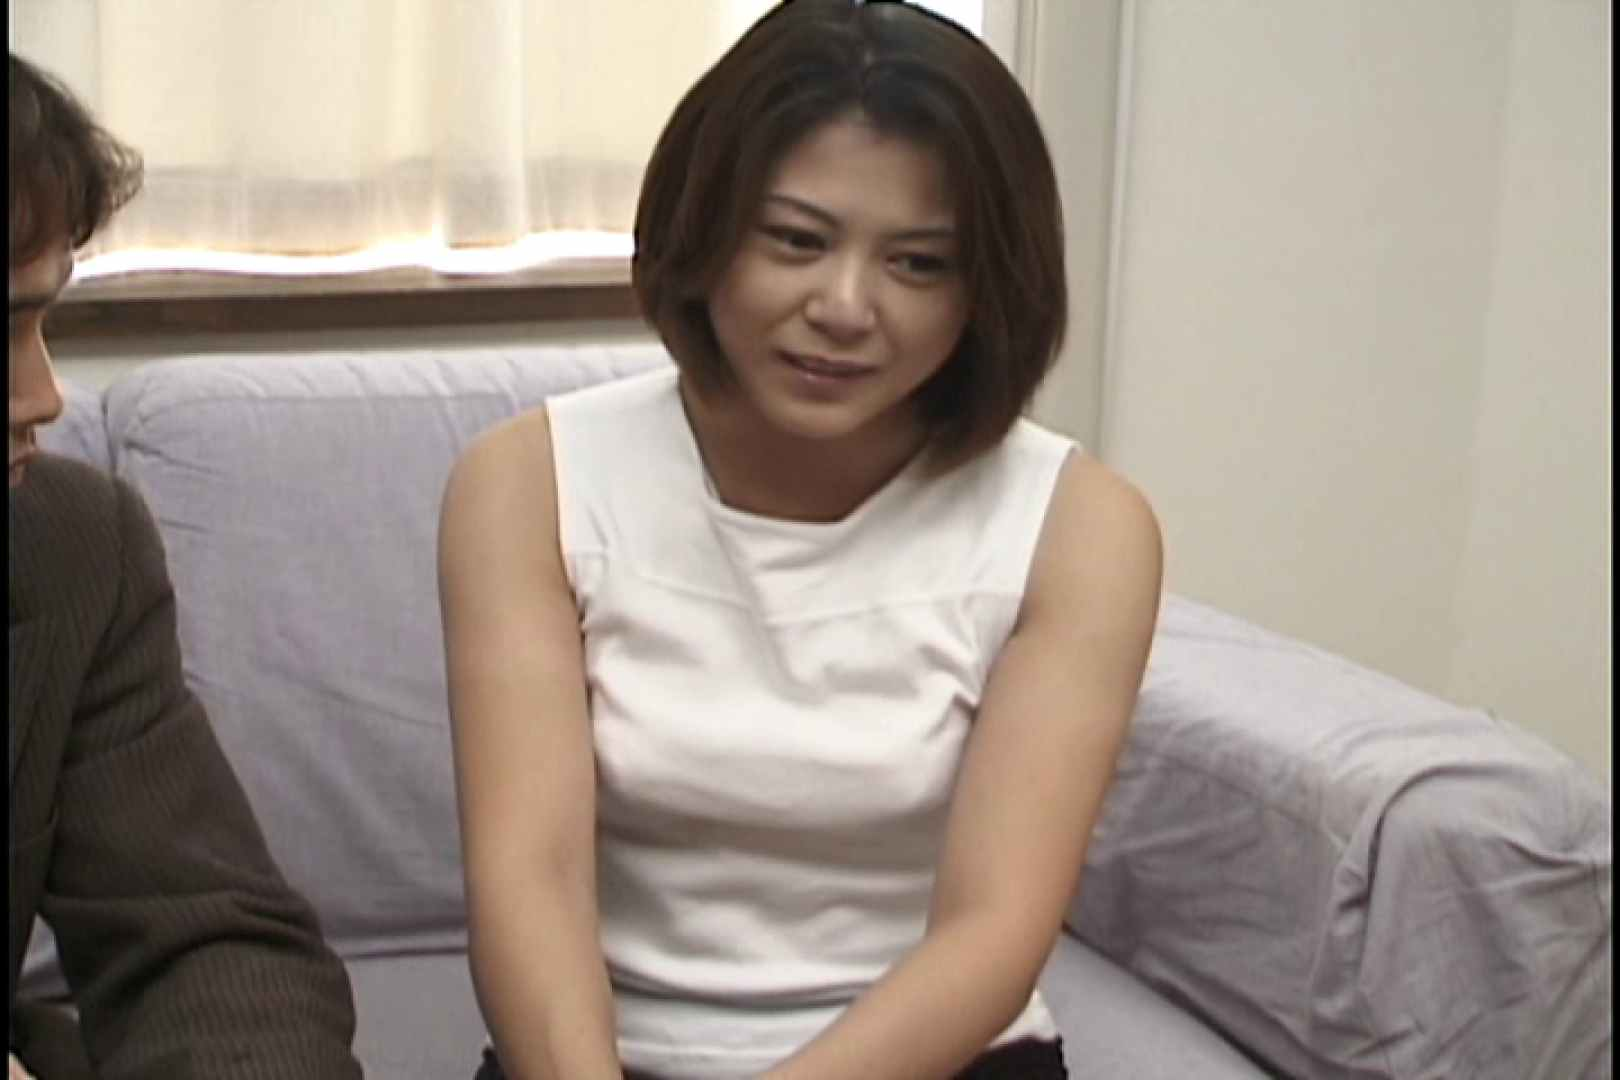 昼間の奥様は欲求不満 ~江口亜紀子~ 熟女  54連発 8